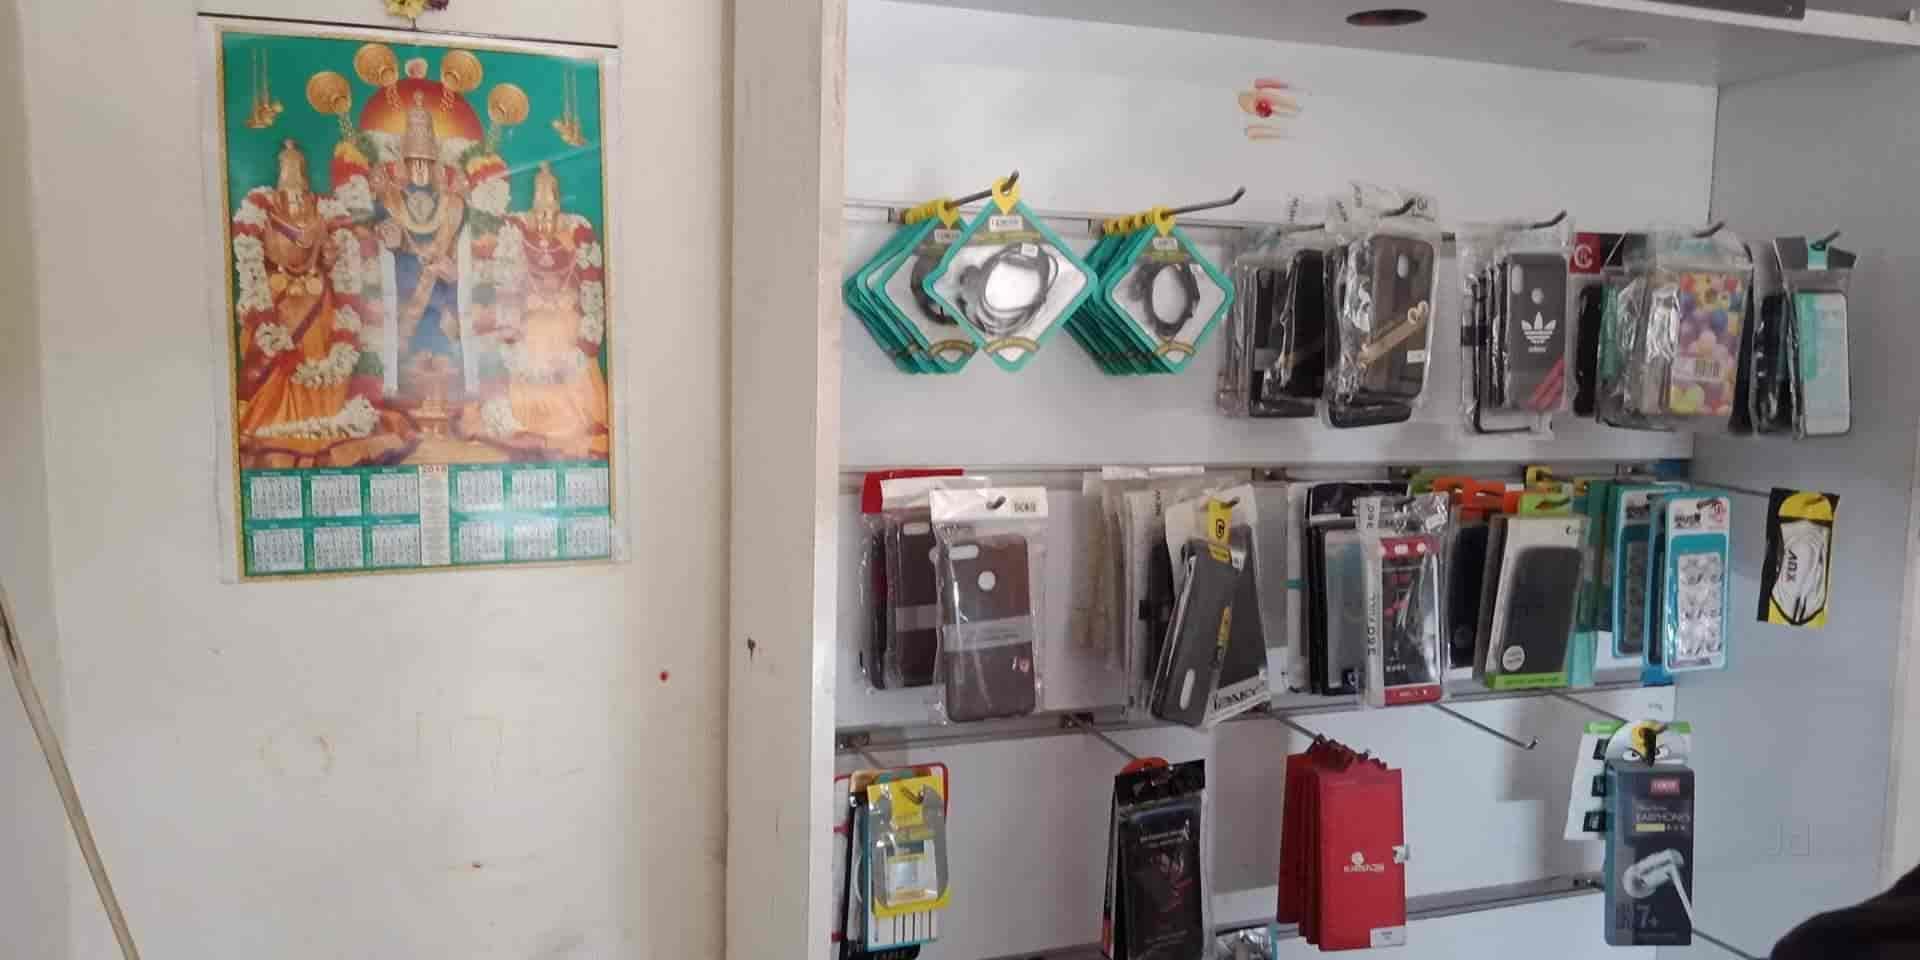 Satellite Mobile Shop Reviews, Porur, Chennai - 6 Ratings